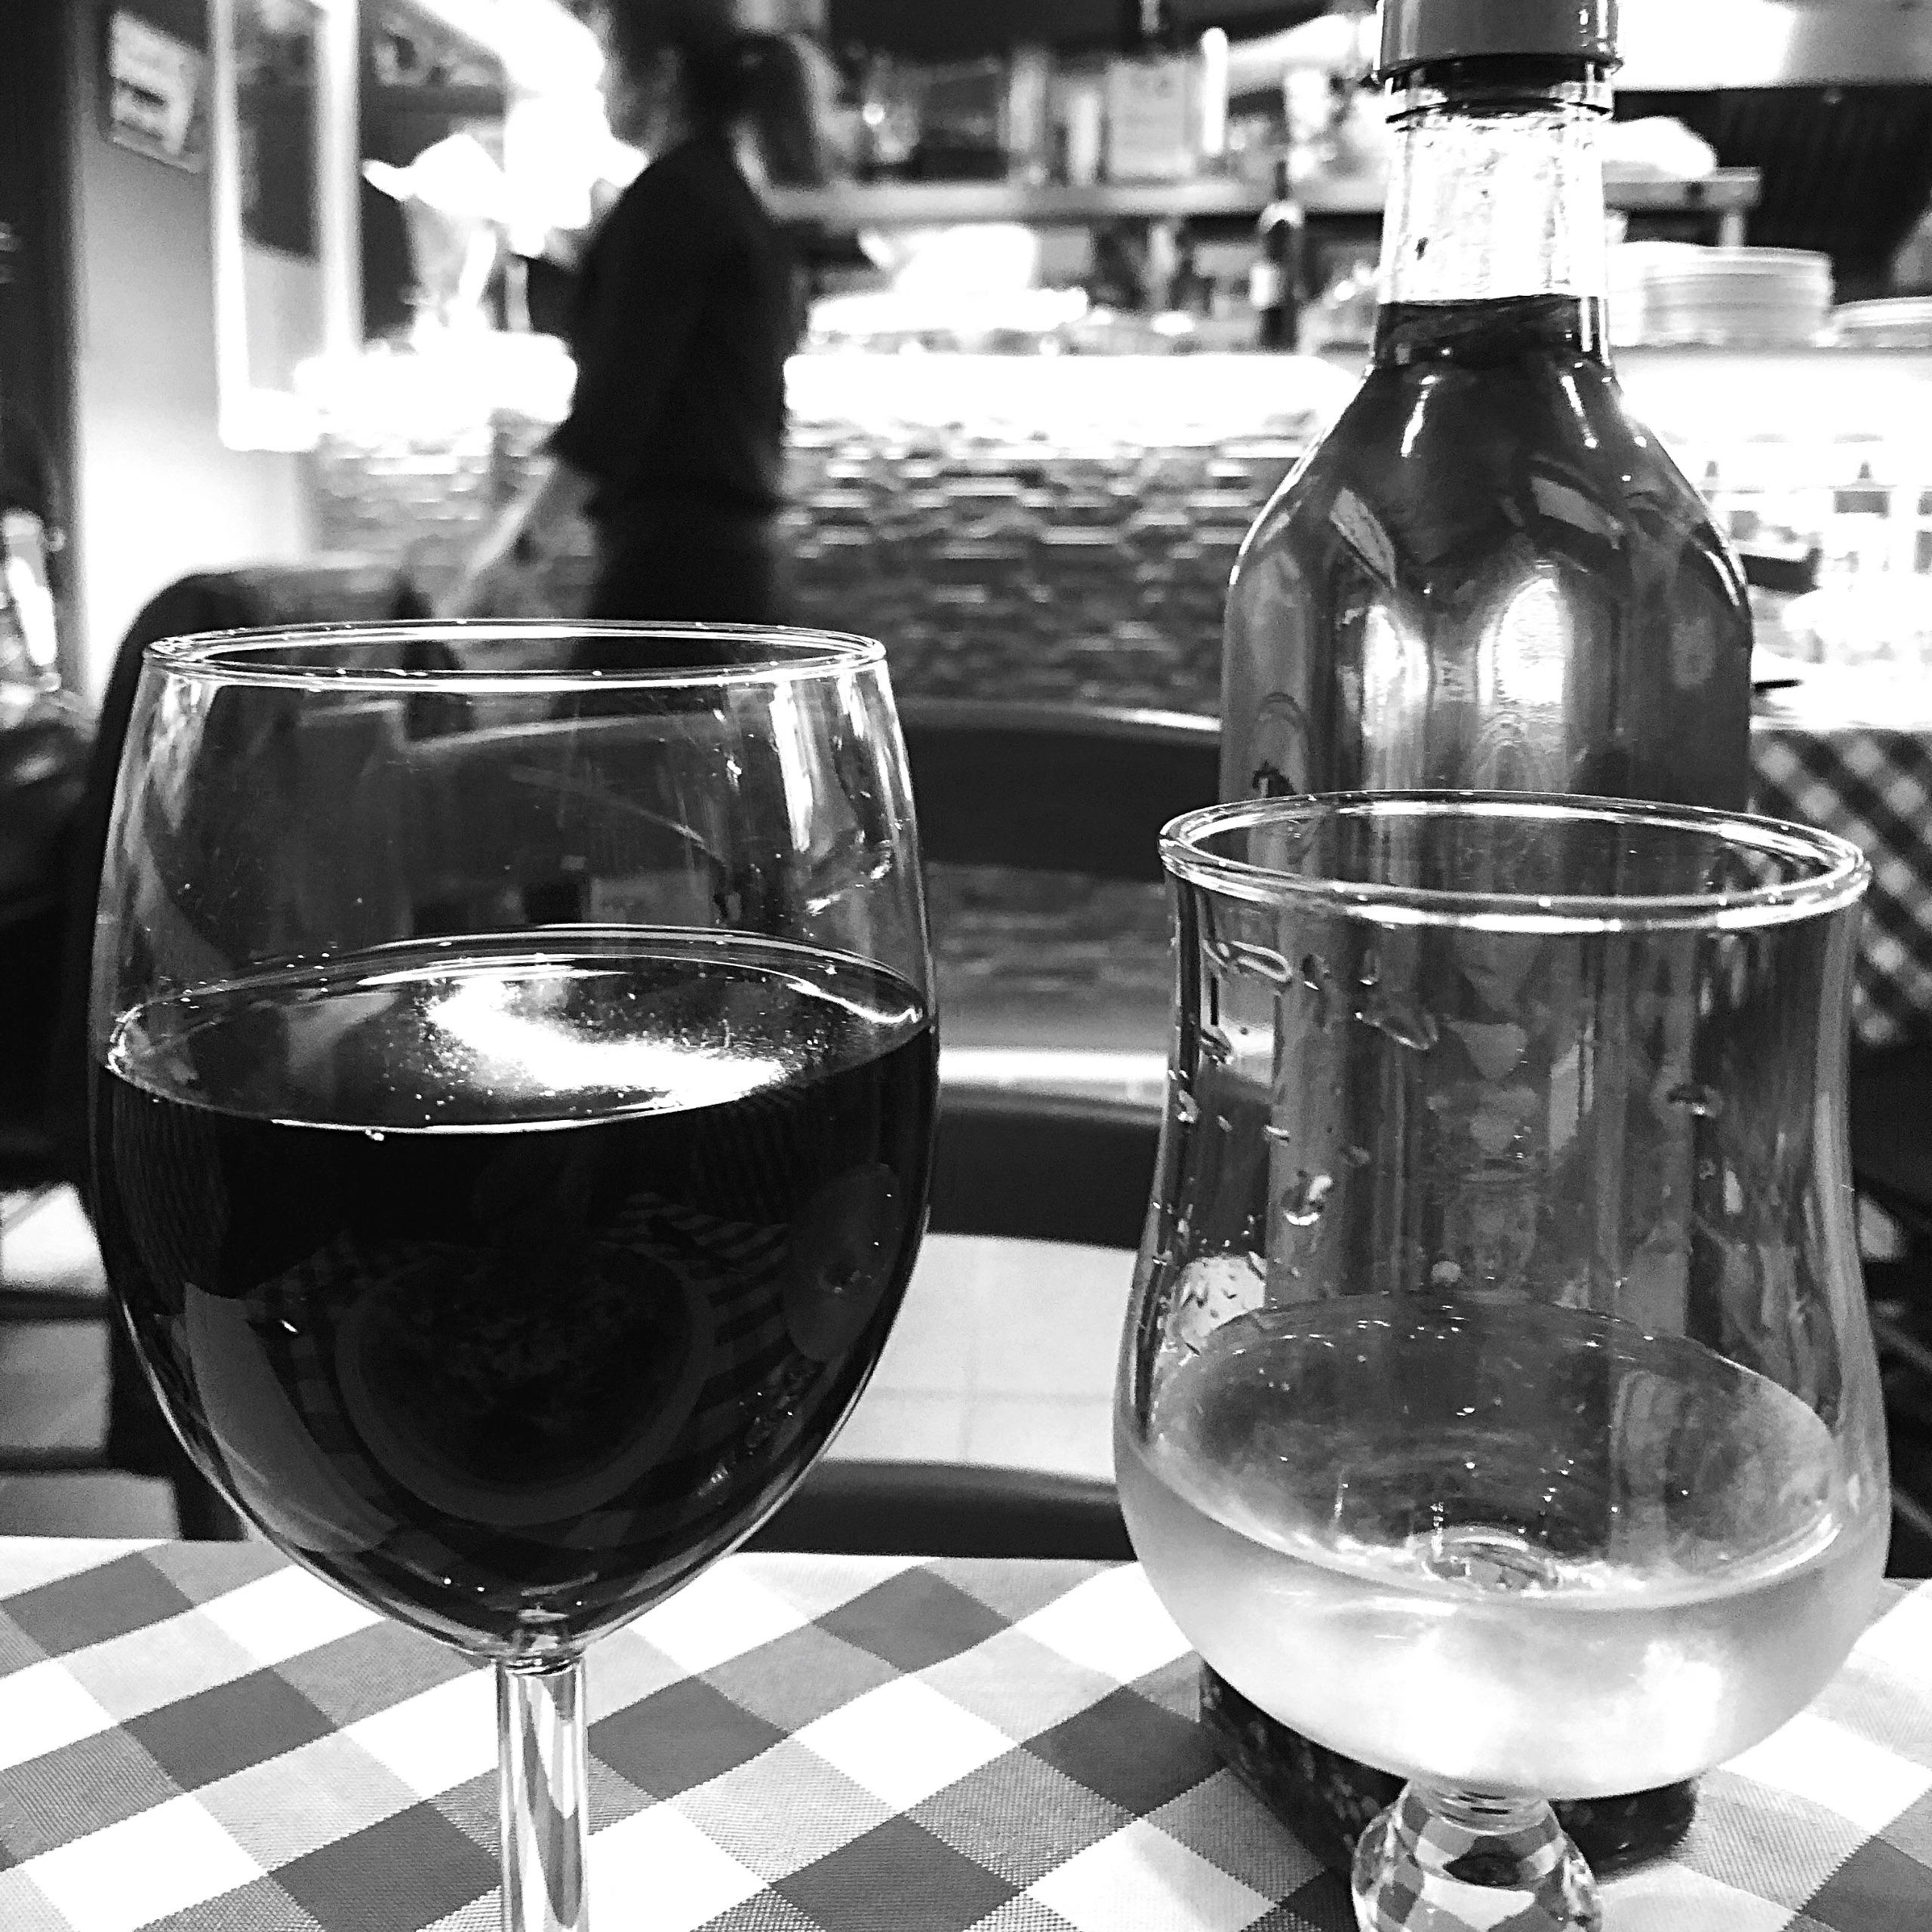 rot drink Unzipped exist  - capture - jo-her   ello